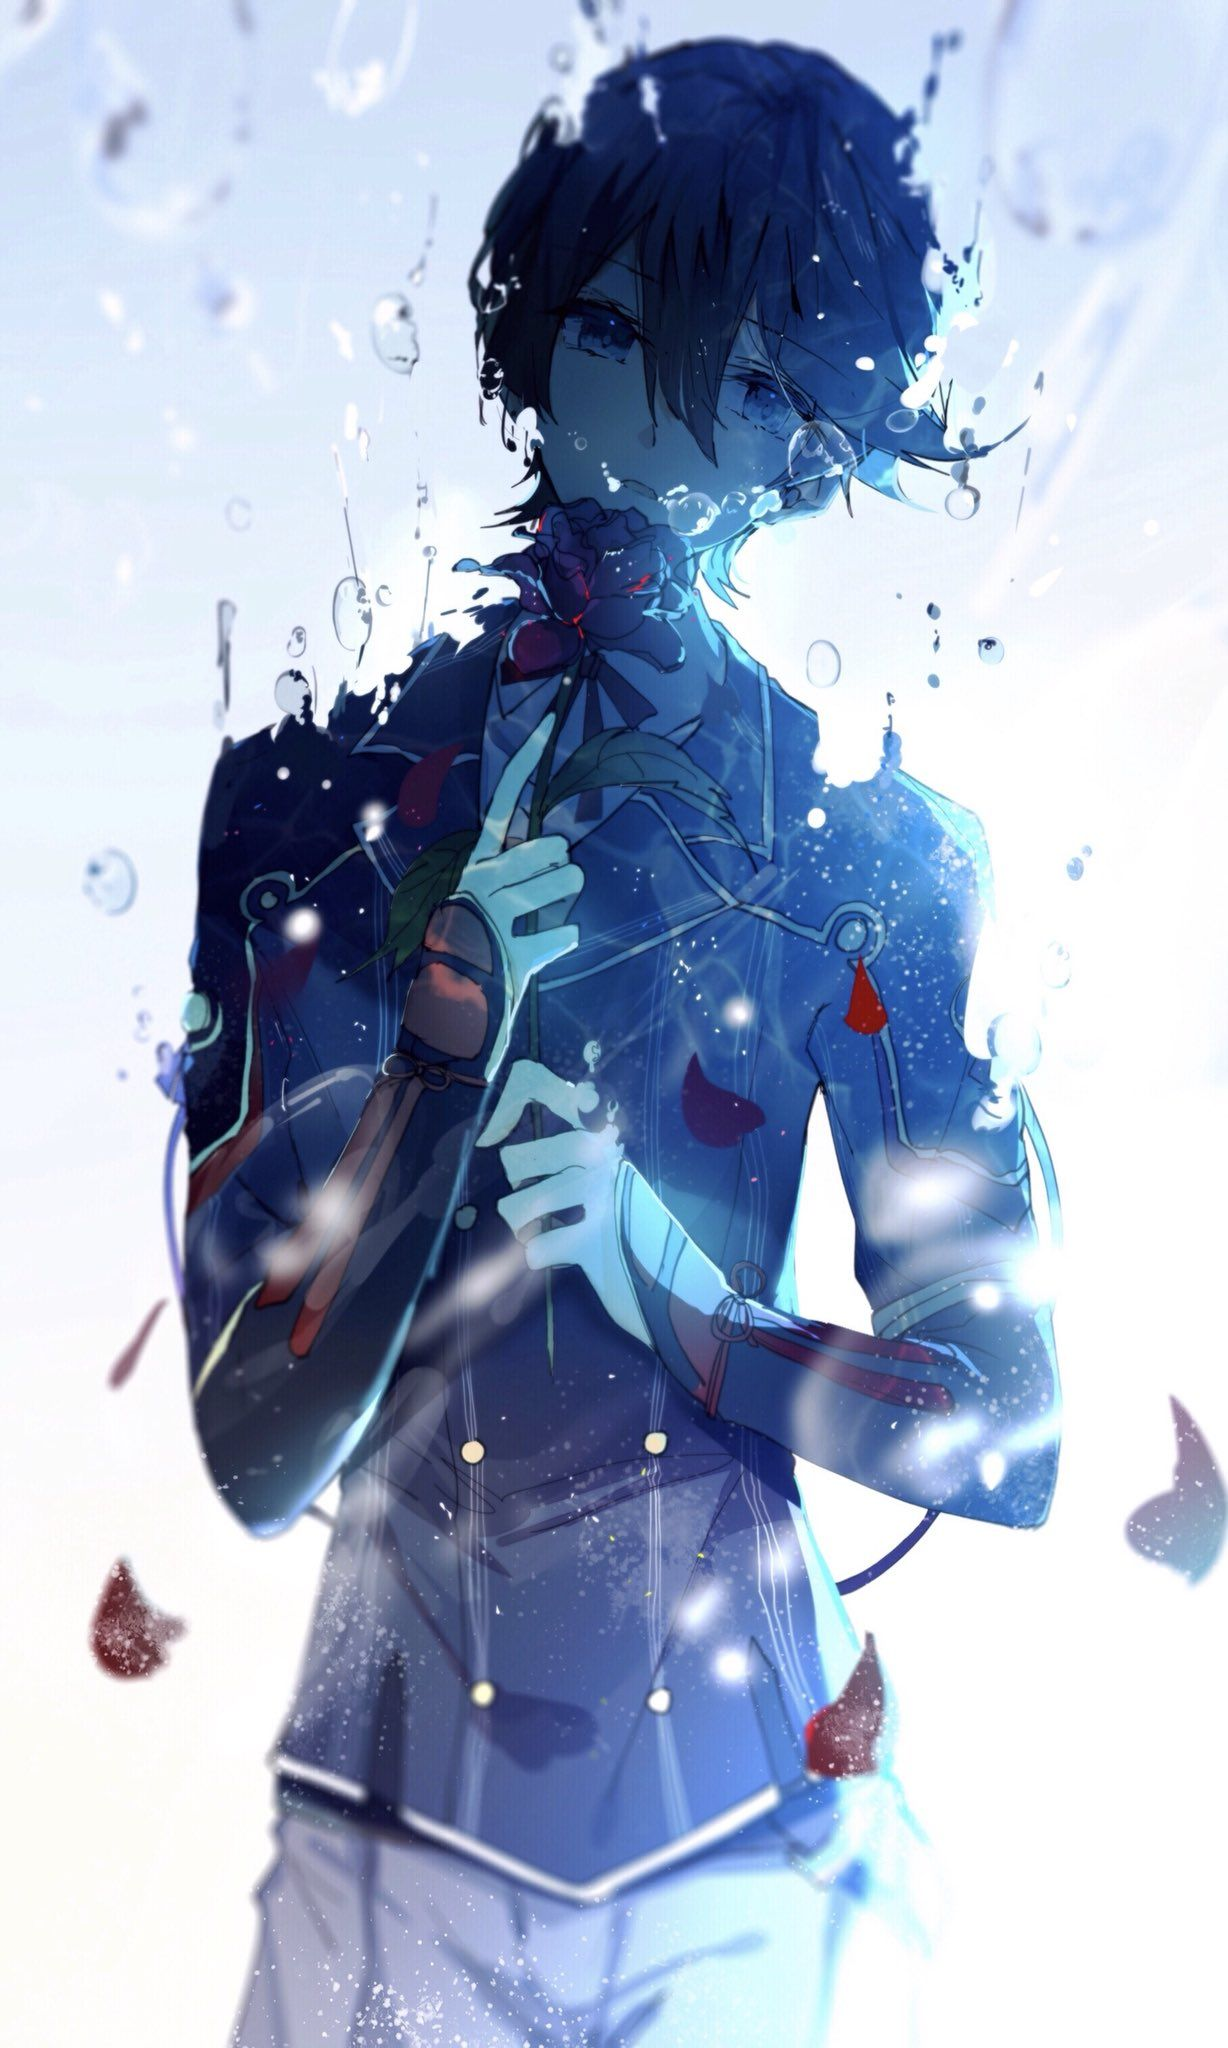 Anime Guy Blue Epic Anime Art Blue Eyes Water Blue Anime Cute Anime Guys Anime Drawings Boy